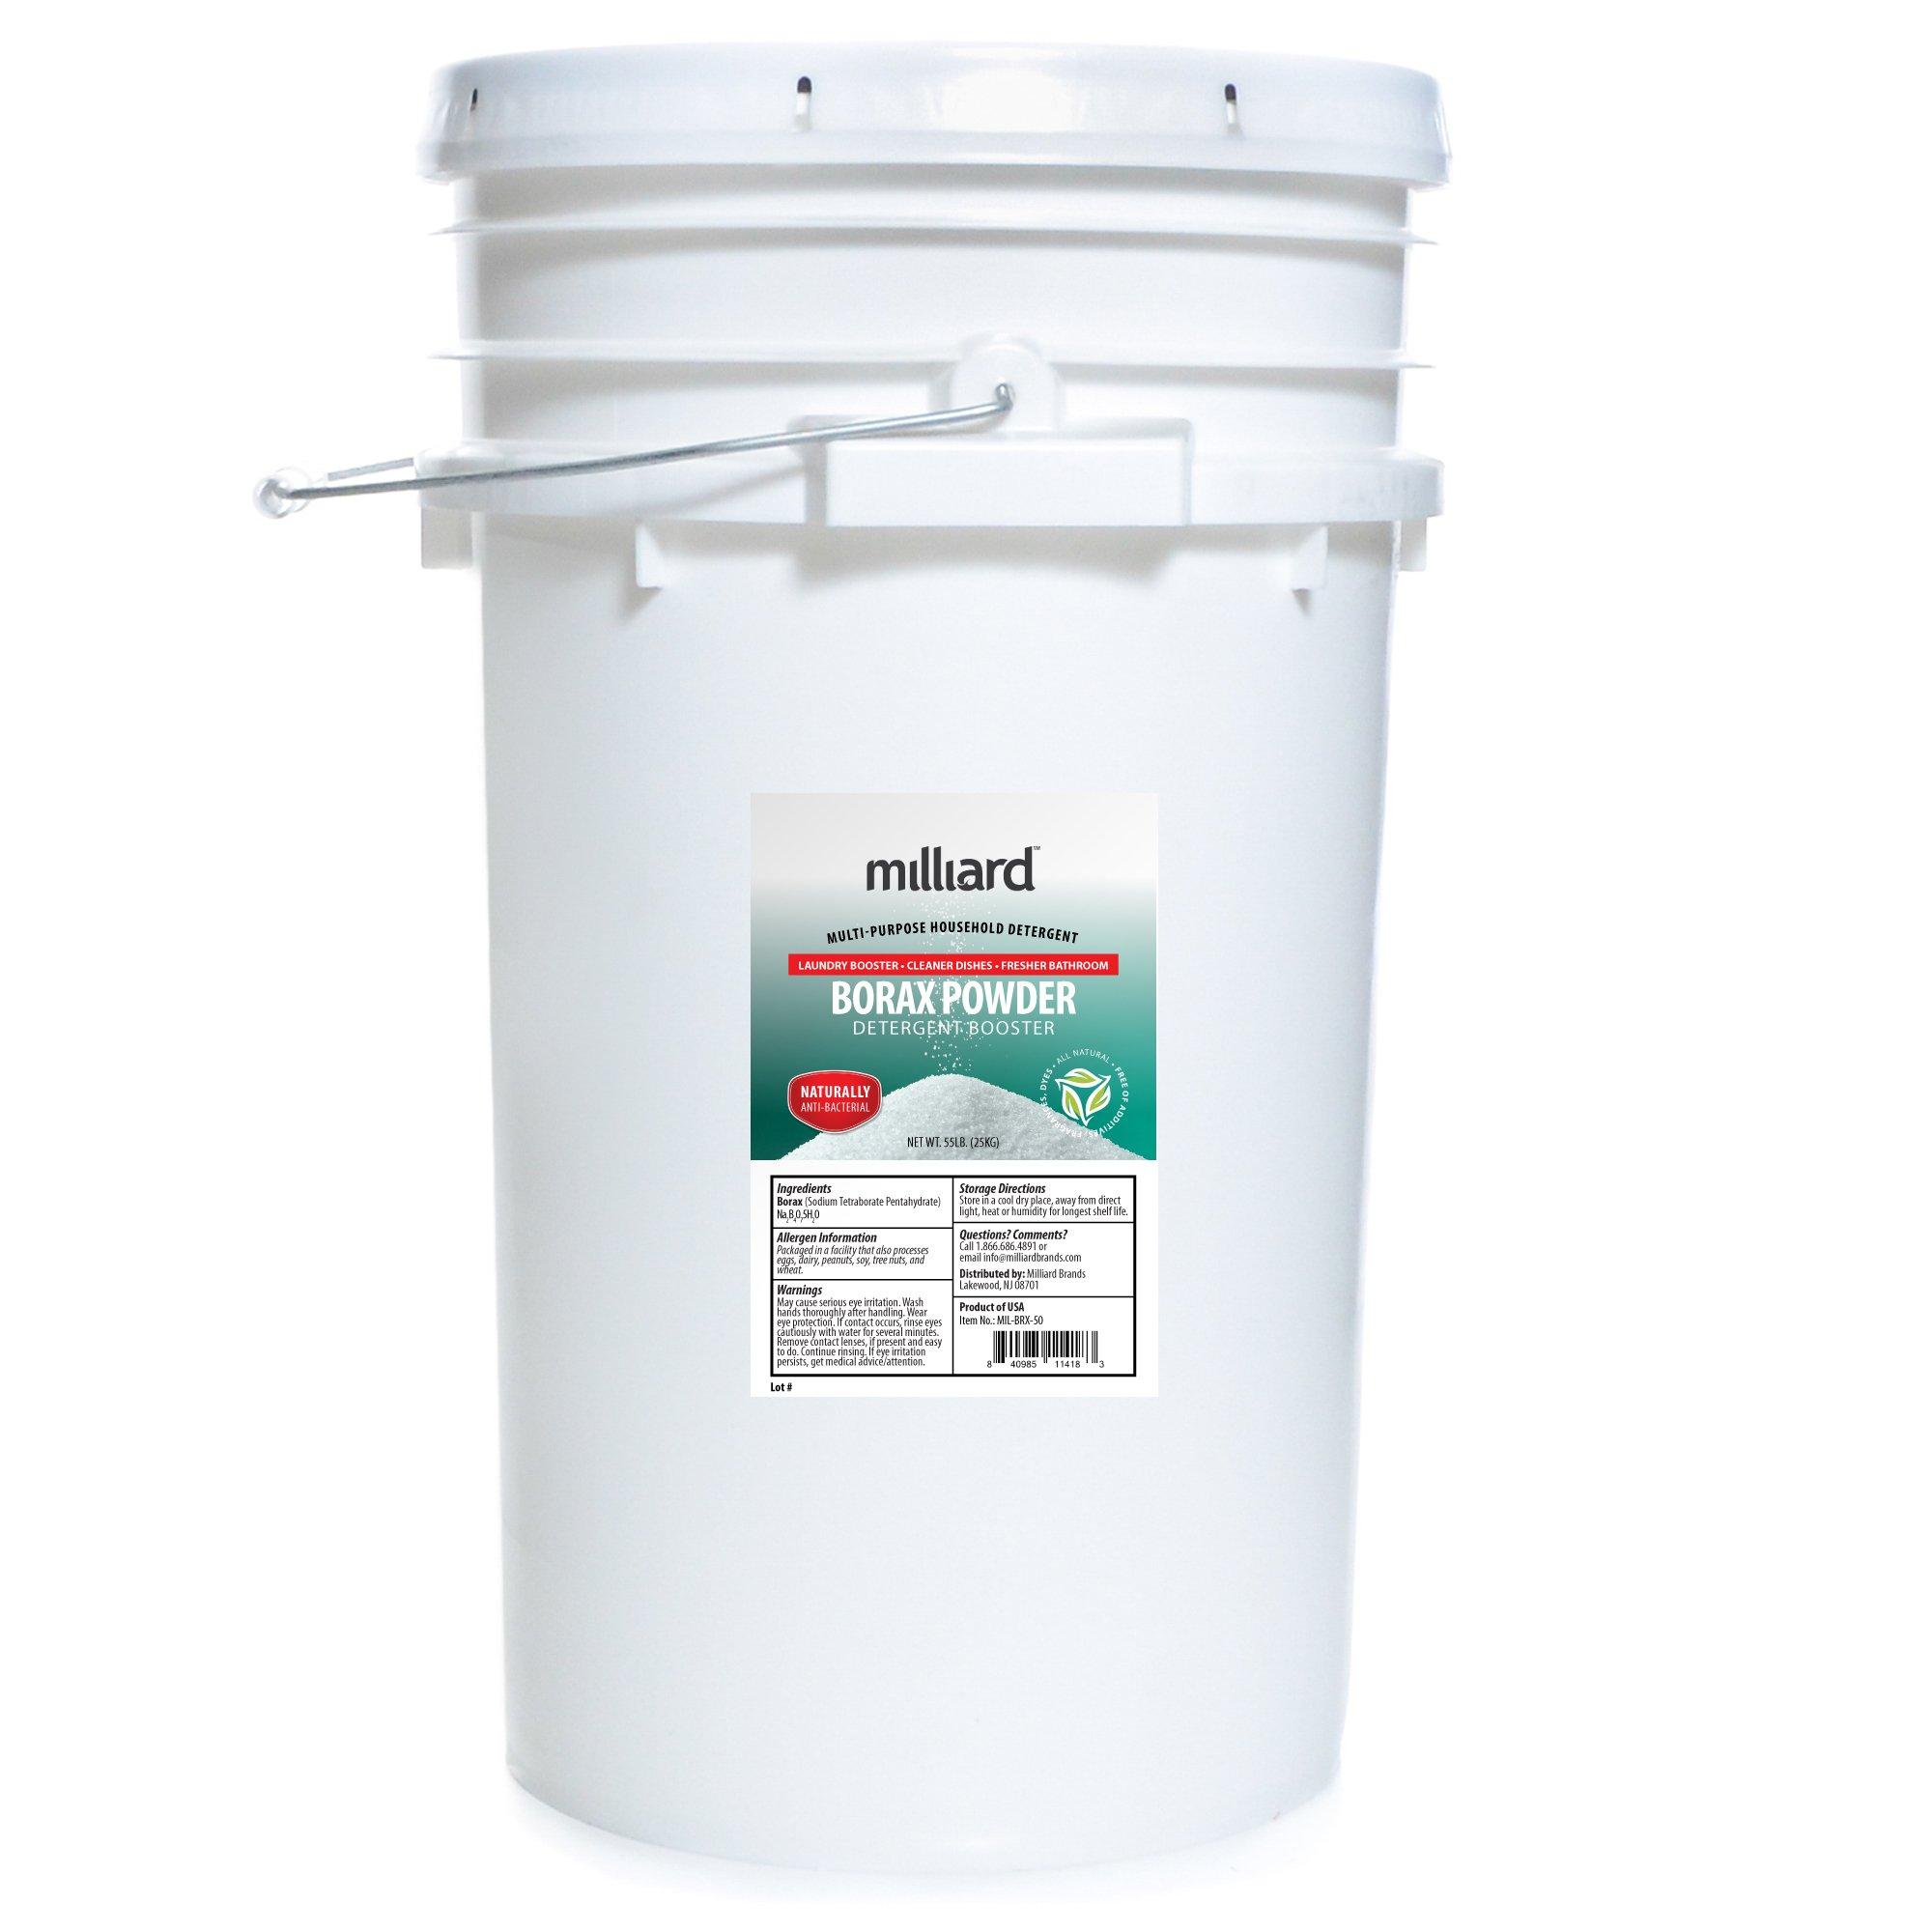 Milliard Borax Powder 55 Pound Bulk -Pure Multi-Purpose Cleaner, Comes in a Re-sealable Plastic Pail (55 POUNDS)